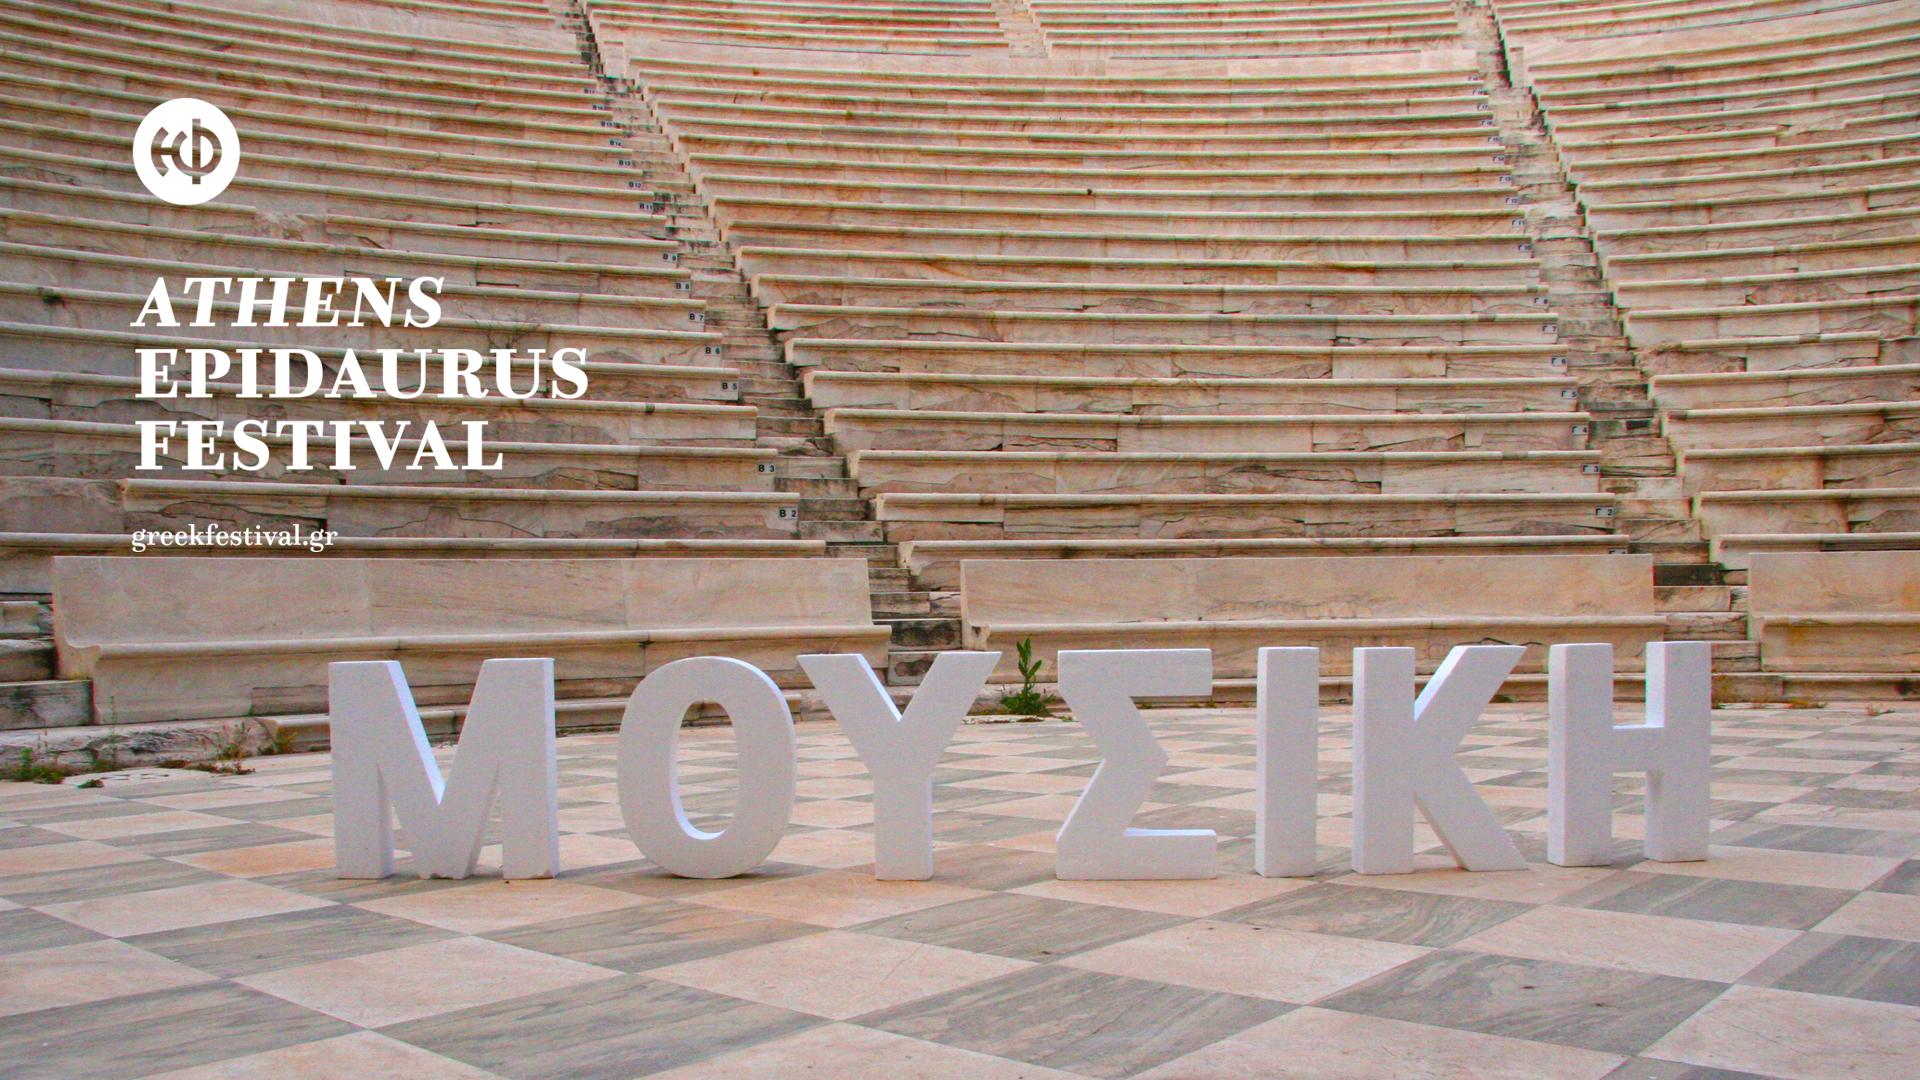 designpark_greek_athens_epidaurus_festival._identity